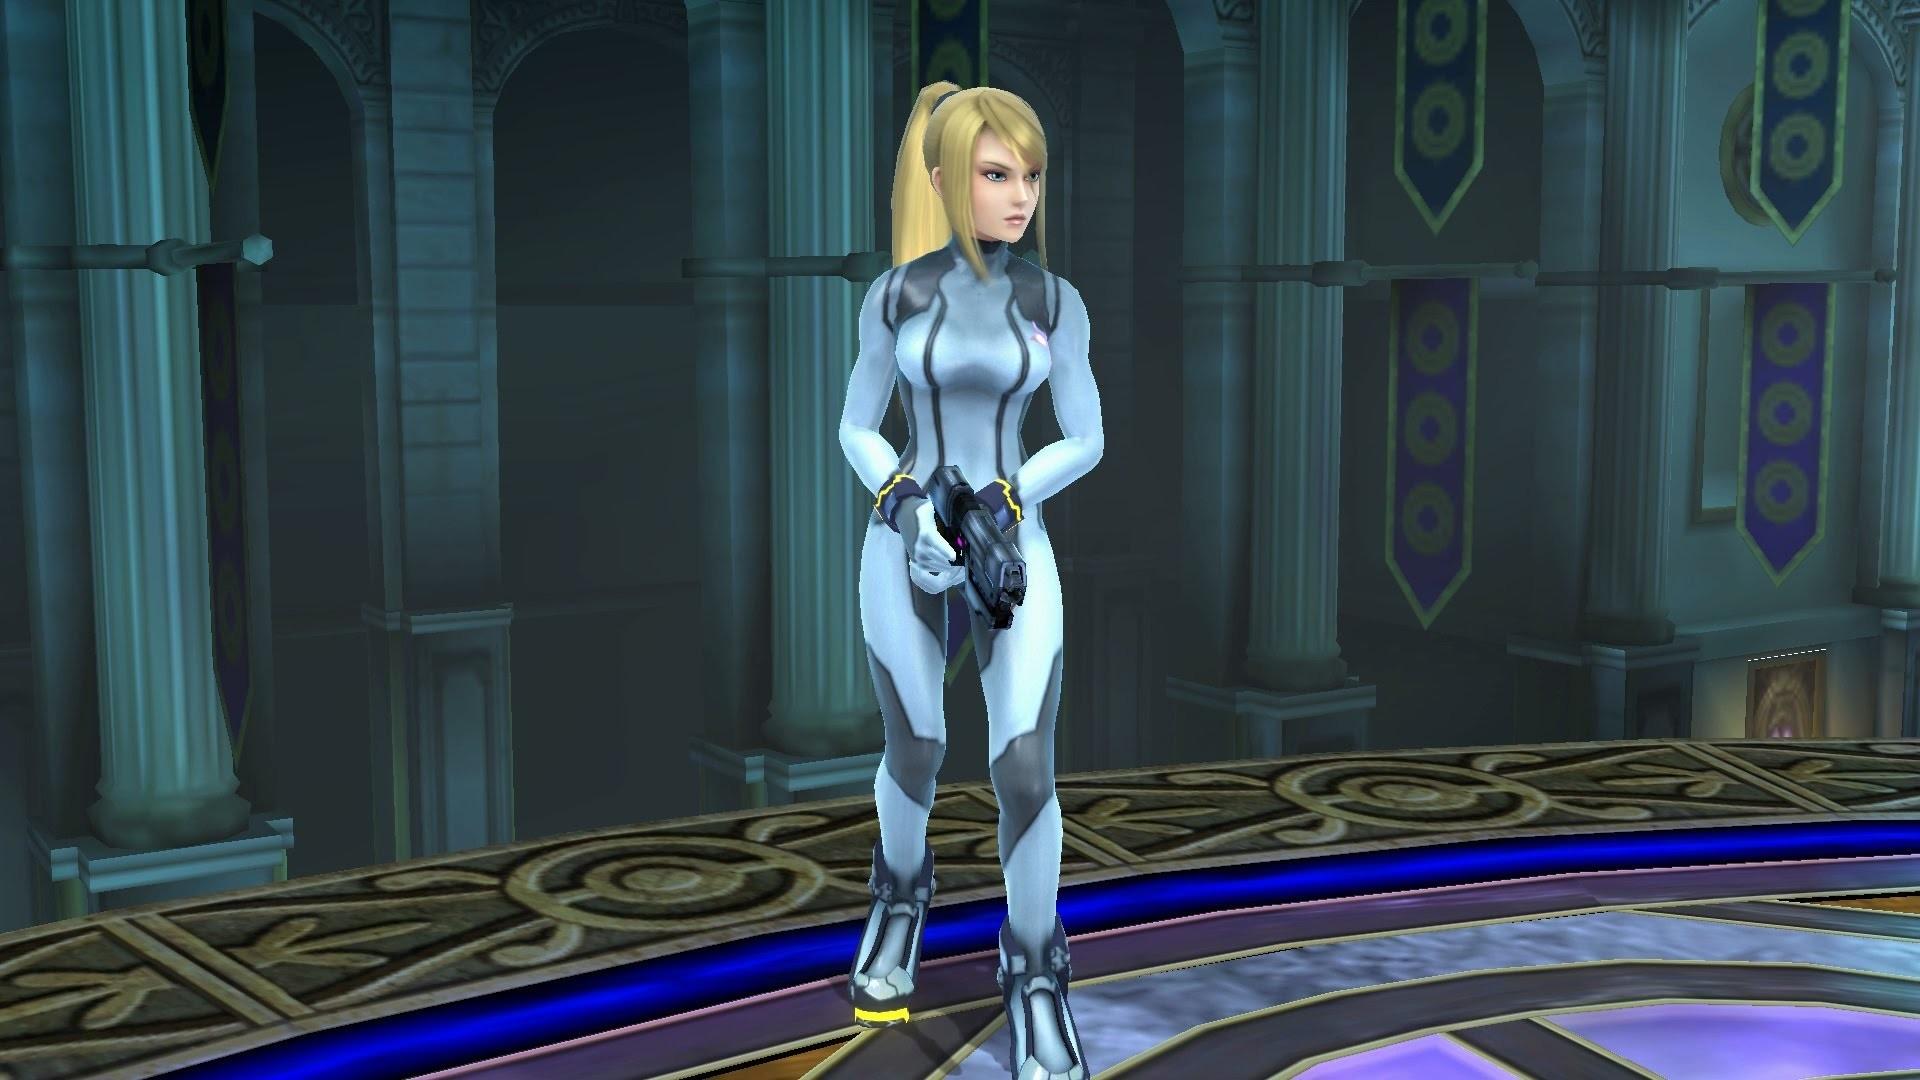 For Wii U : Zero Suit Samus All-Star Challenge (Bonus Video)